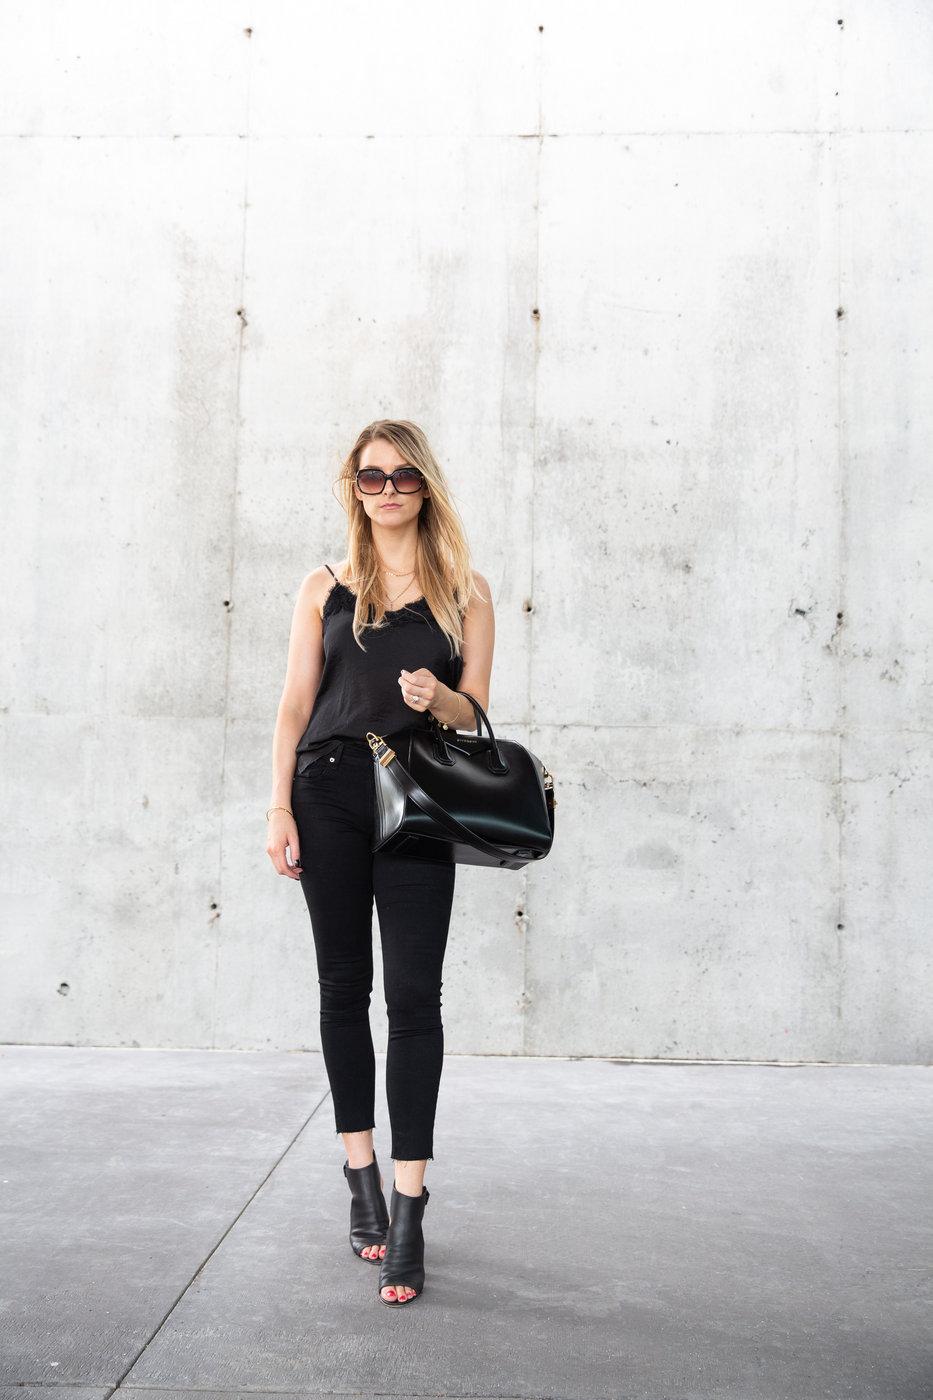 1 person, girl in all black outfit, Givenchy antigona